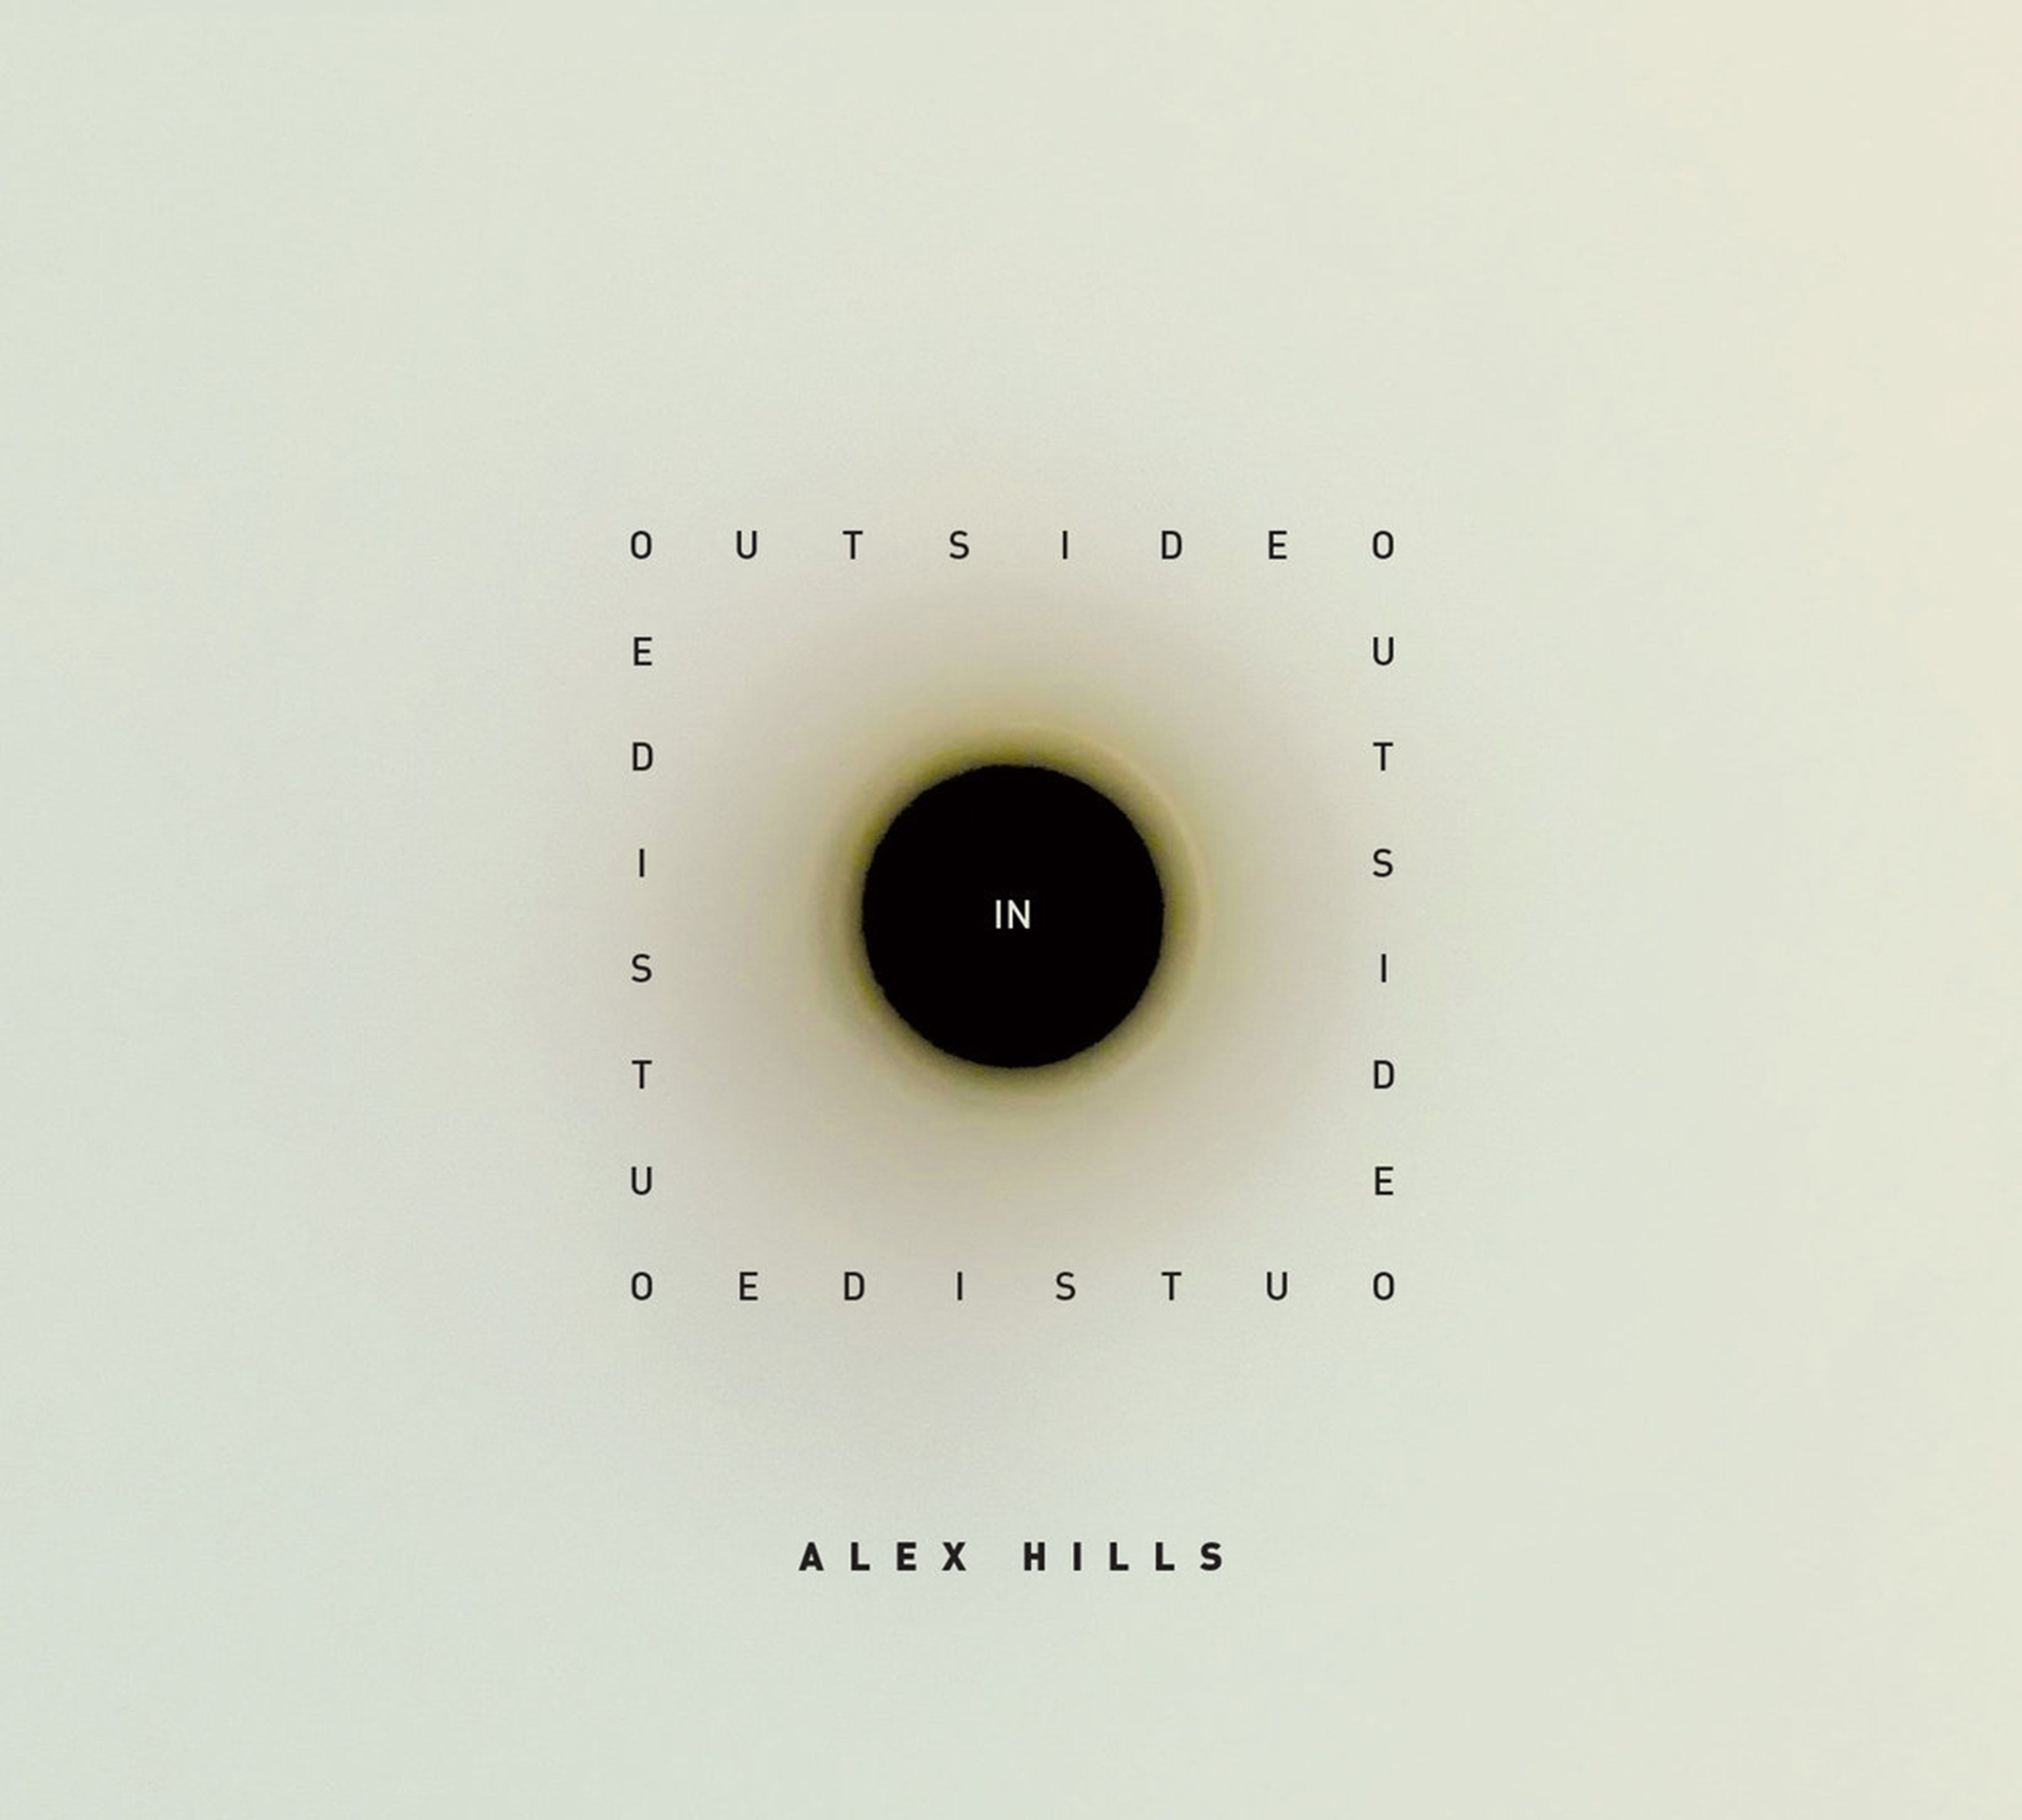 Alex Hills: OutsideIn - 1